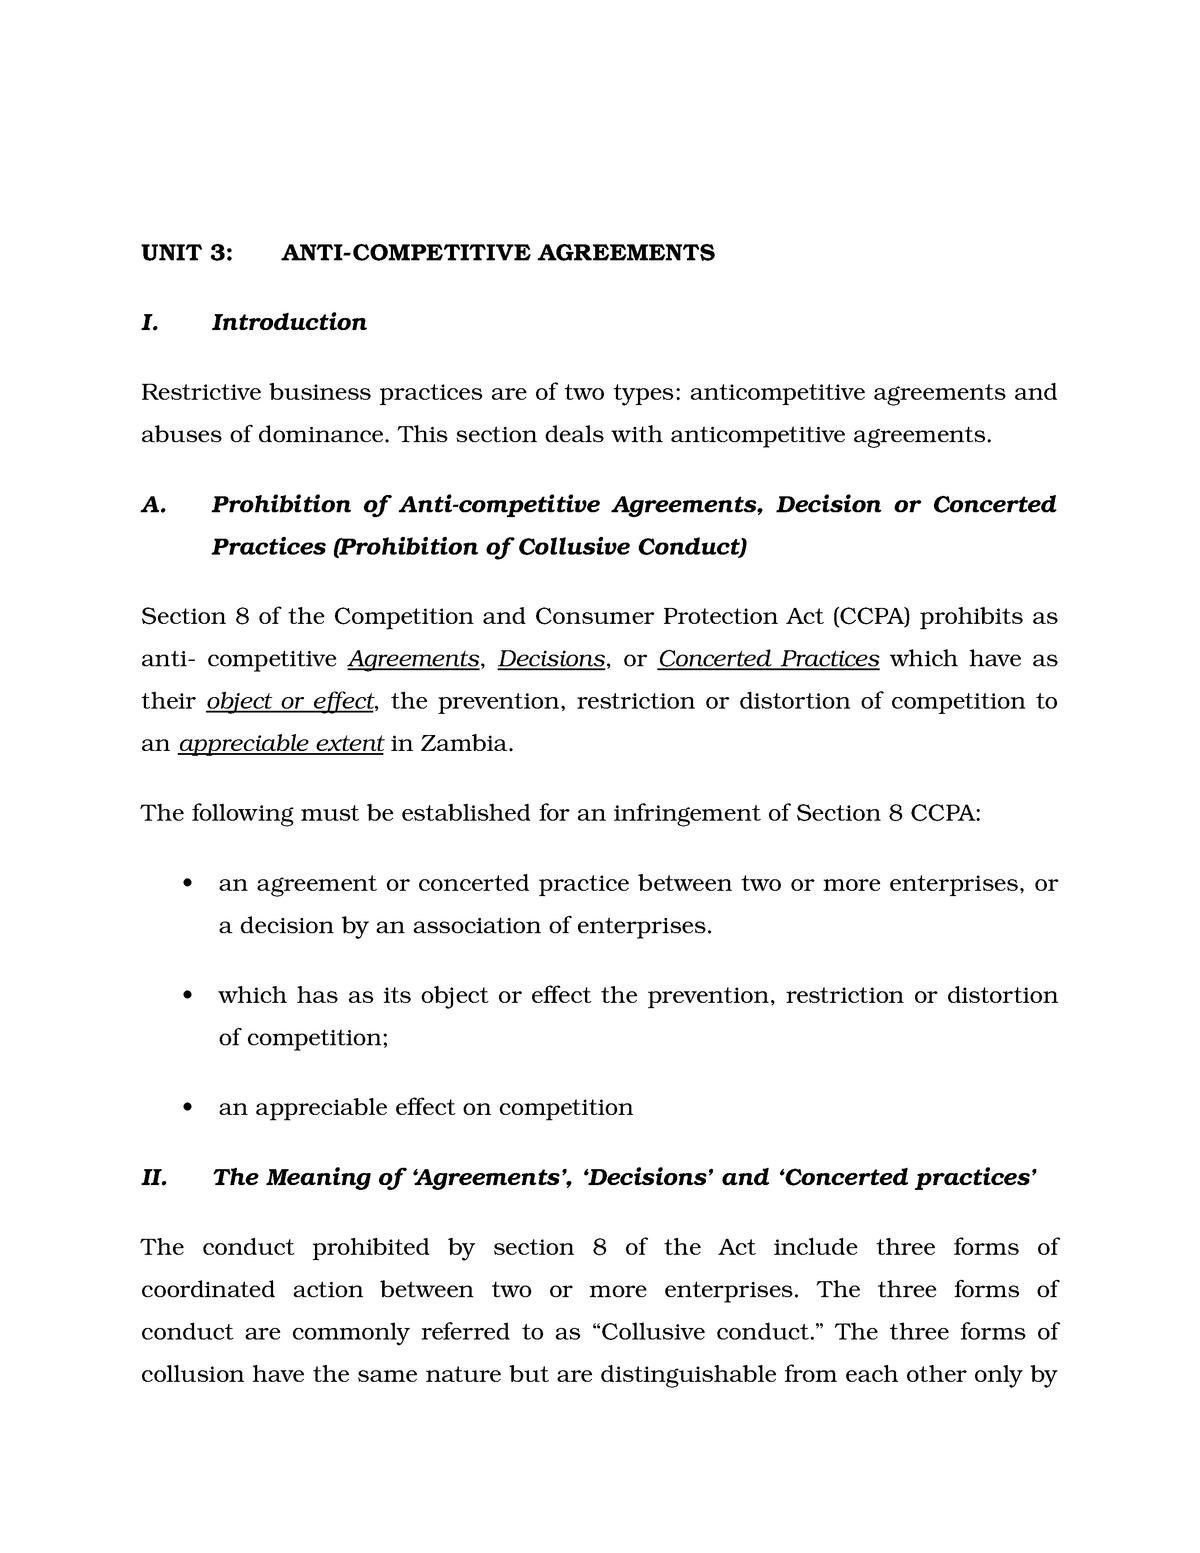 Anti-Competitive Agreements Zambia - L300: Company law - StuDocu